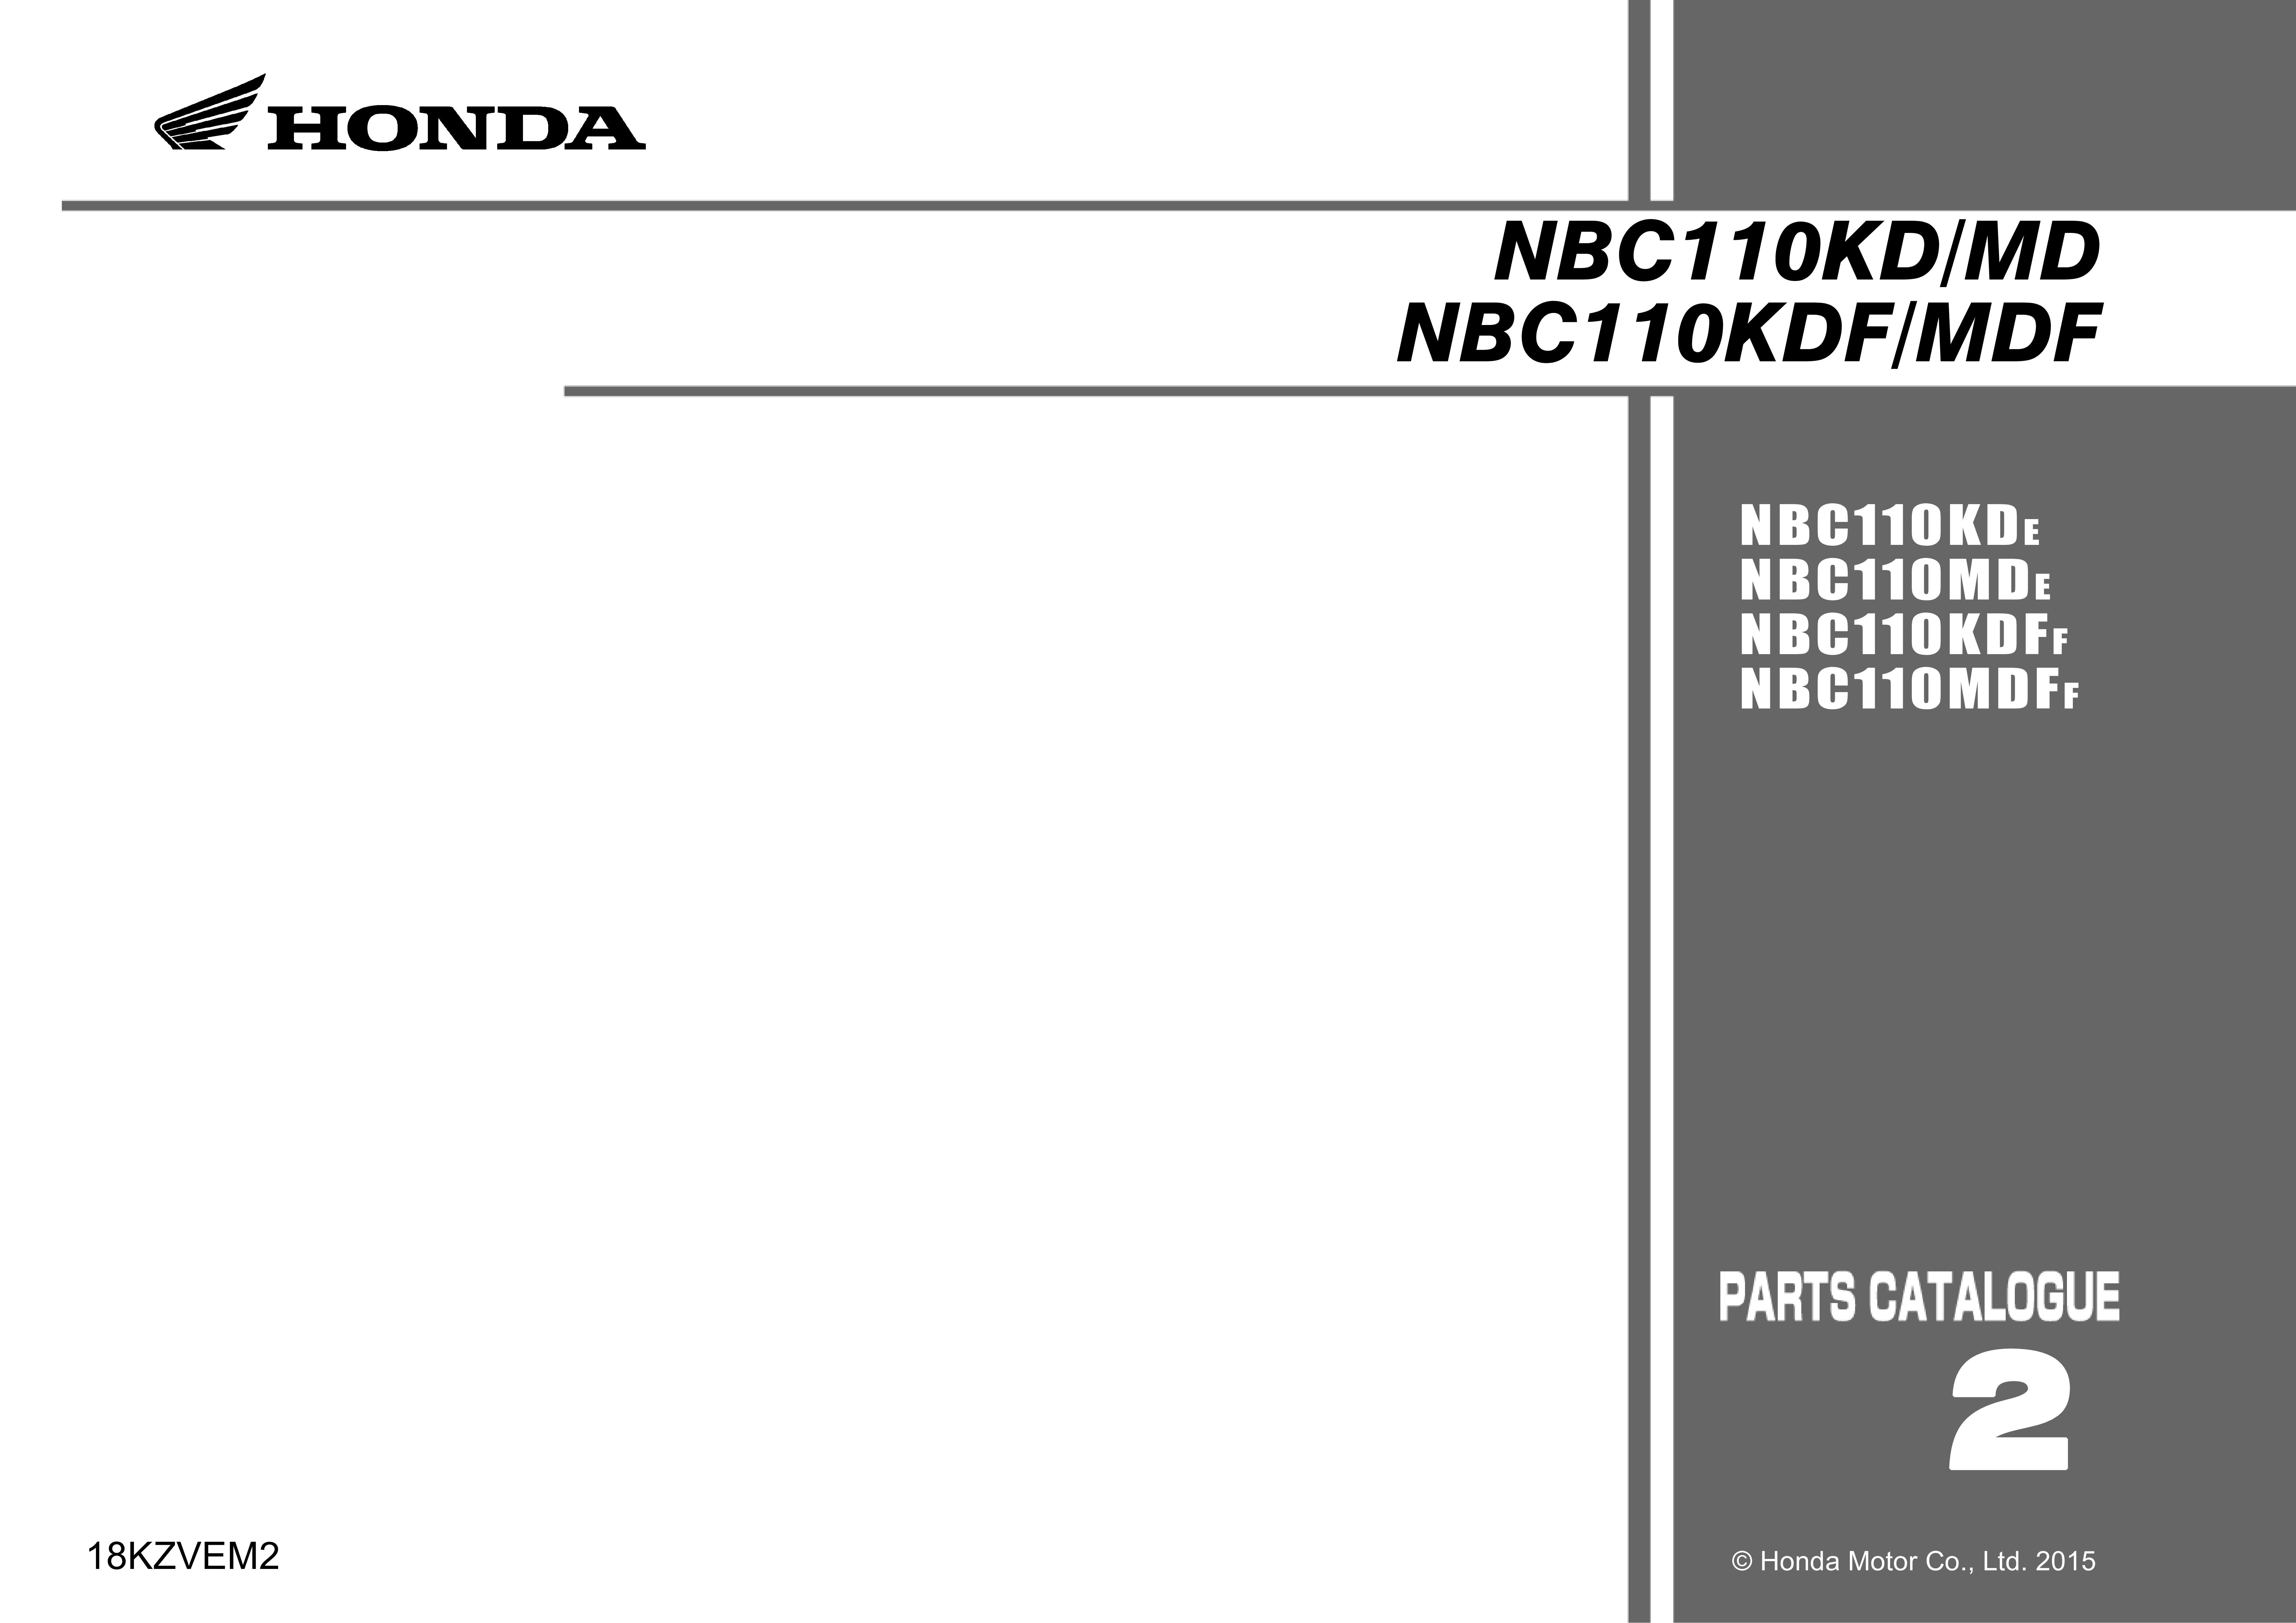 Parts List for Honda NBC110KD Dream 110 (2015)